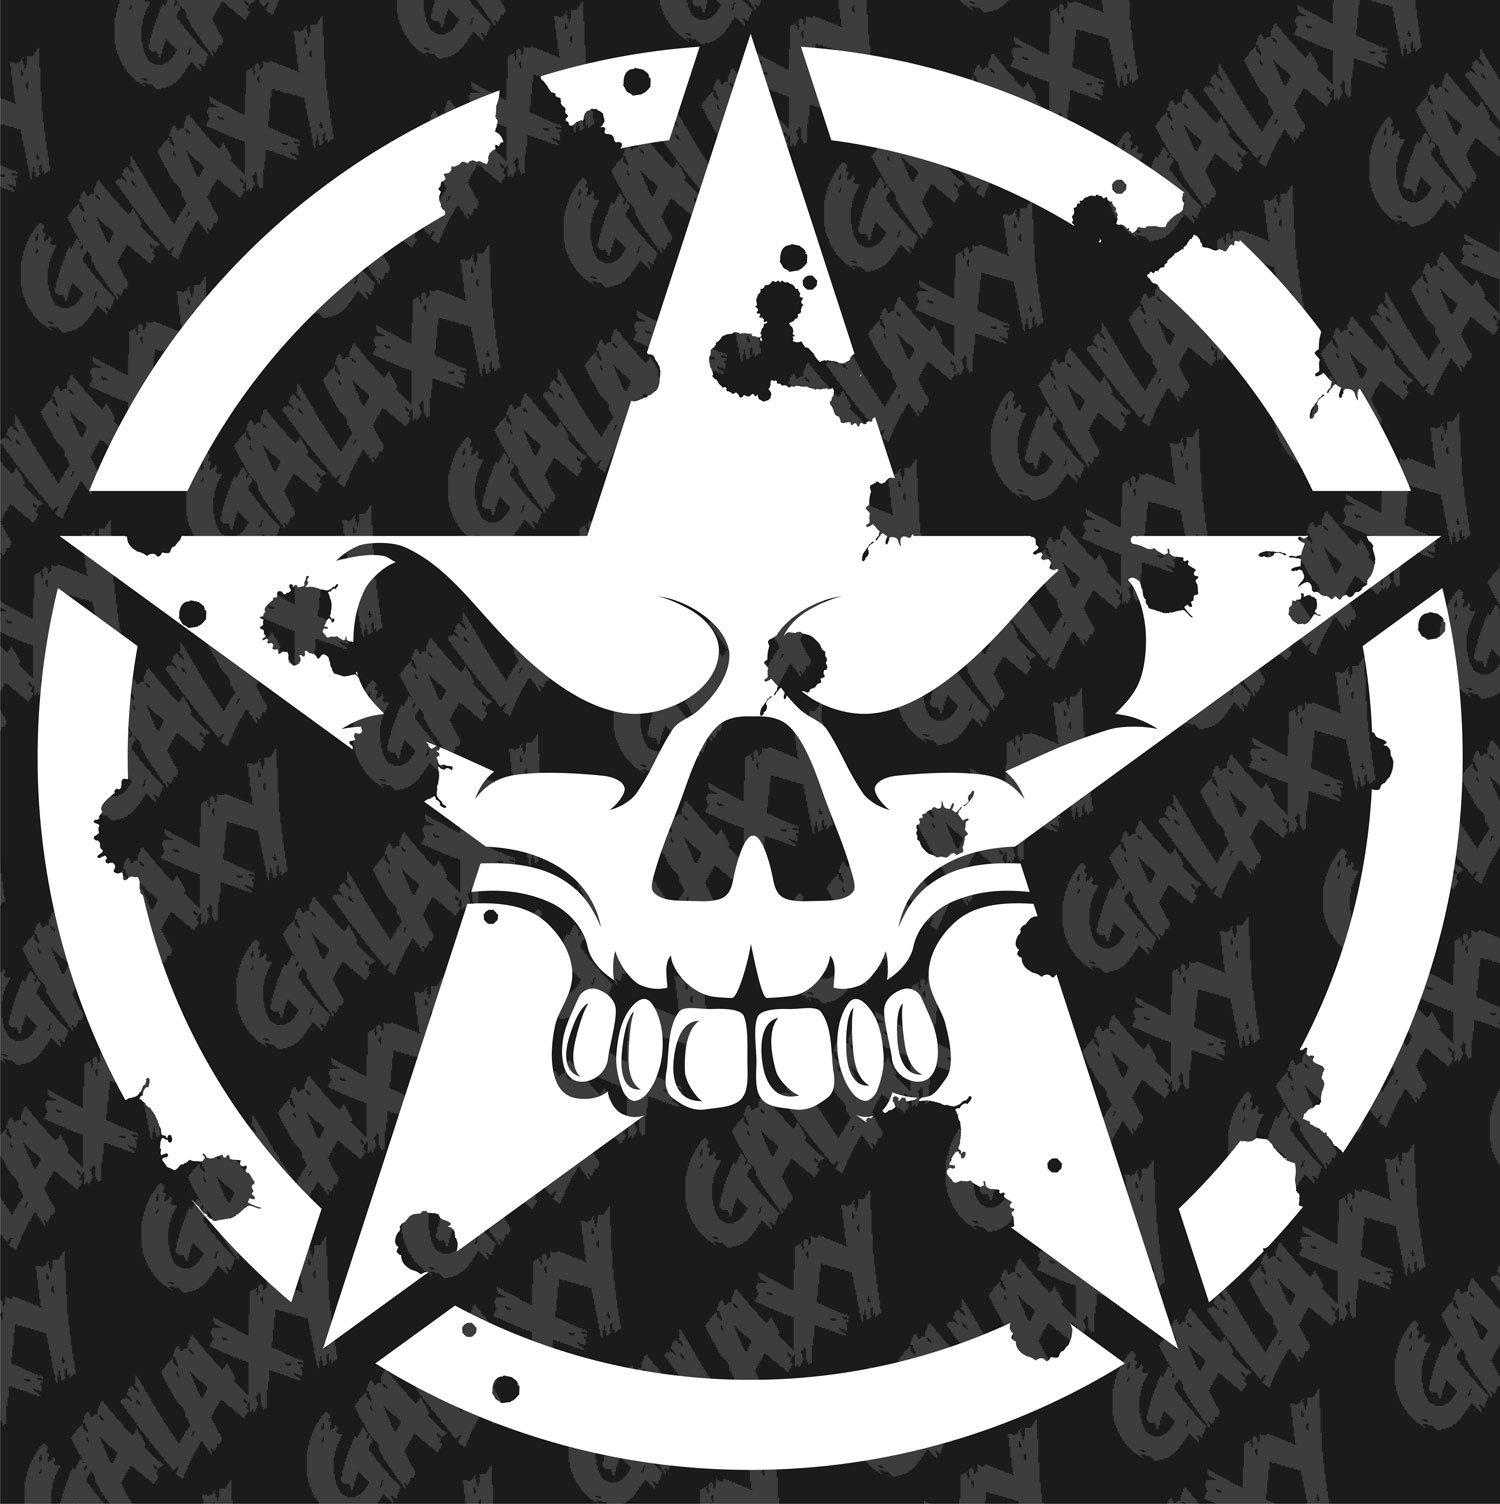 jeep wrangler decal kit sticker set bumper army star skull etsy Badass Jeep Wrangler 50